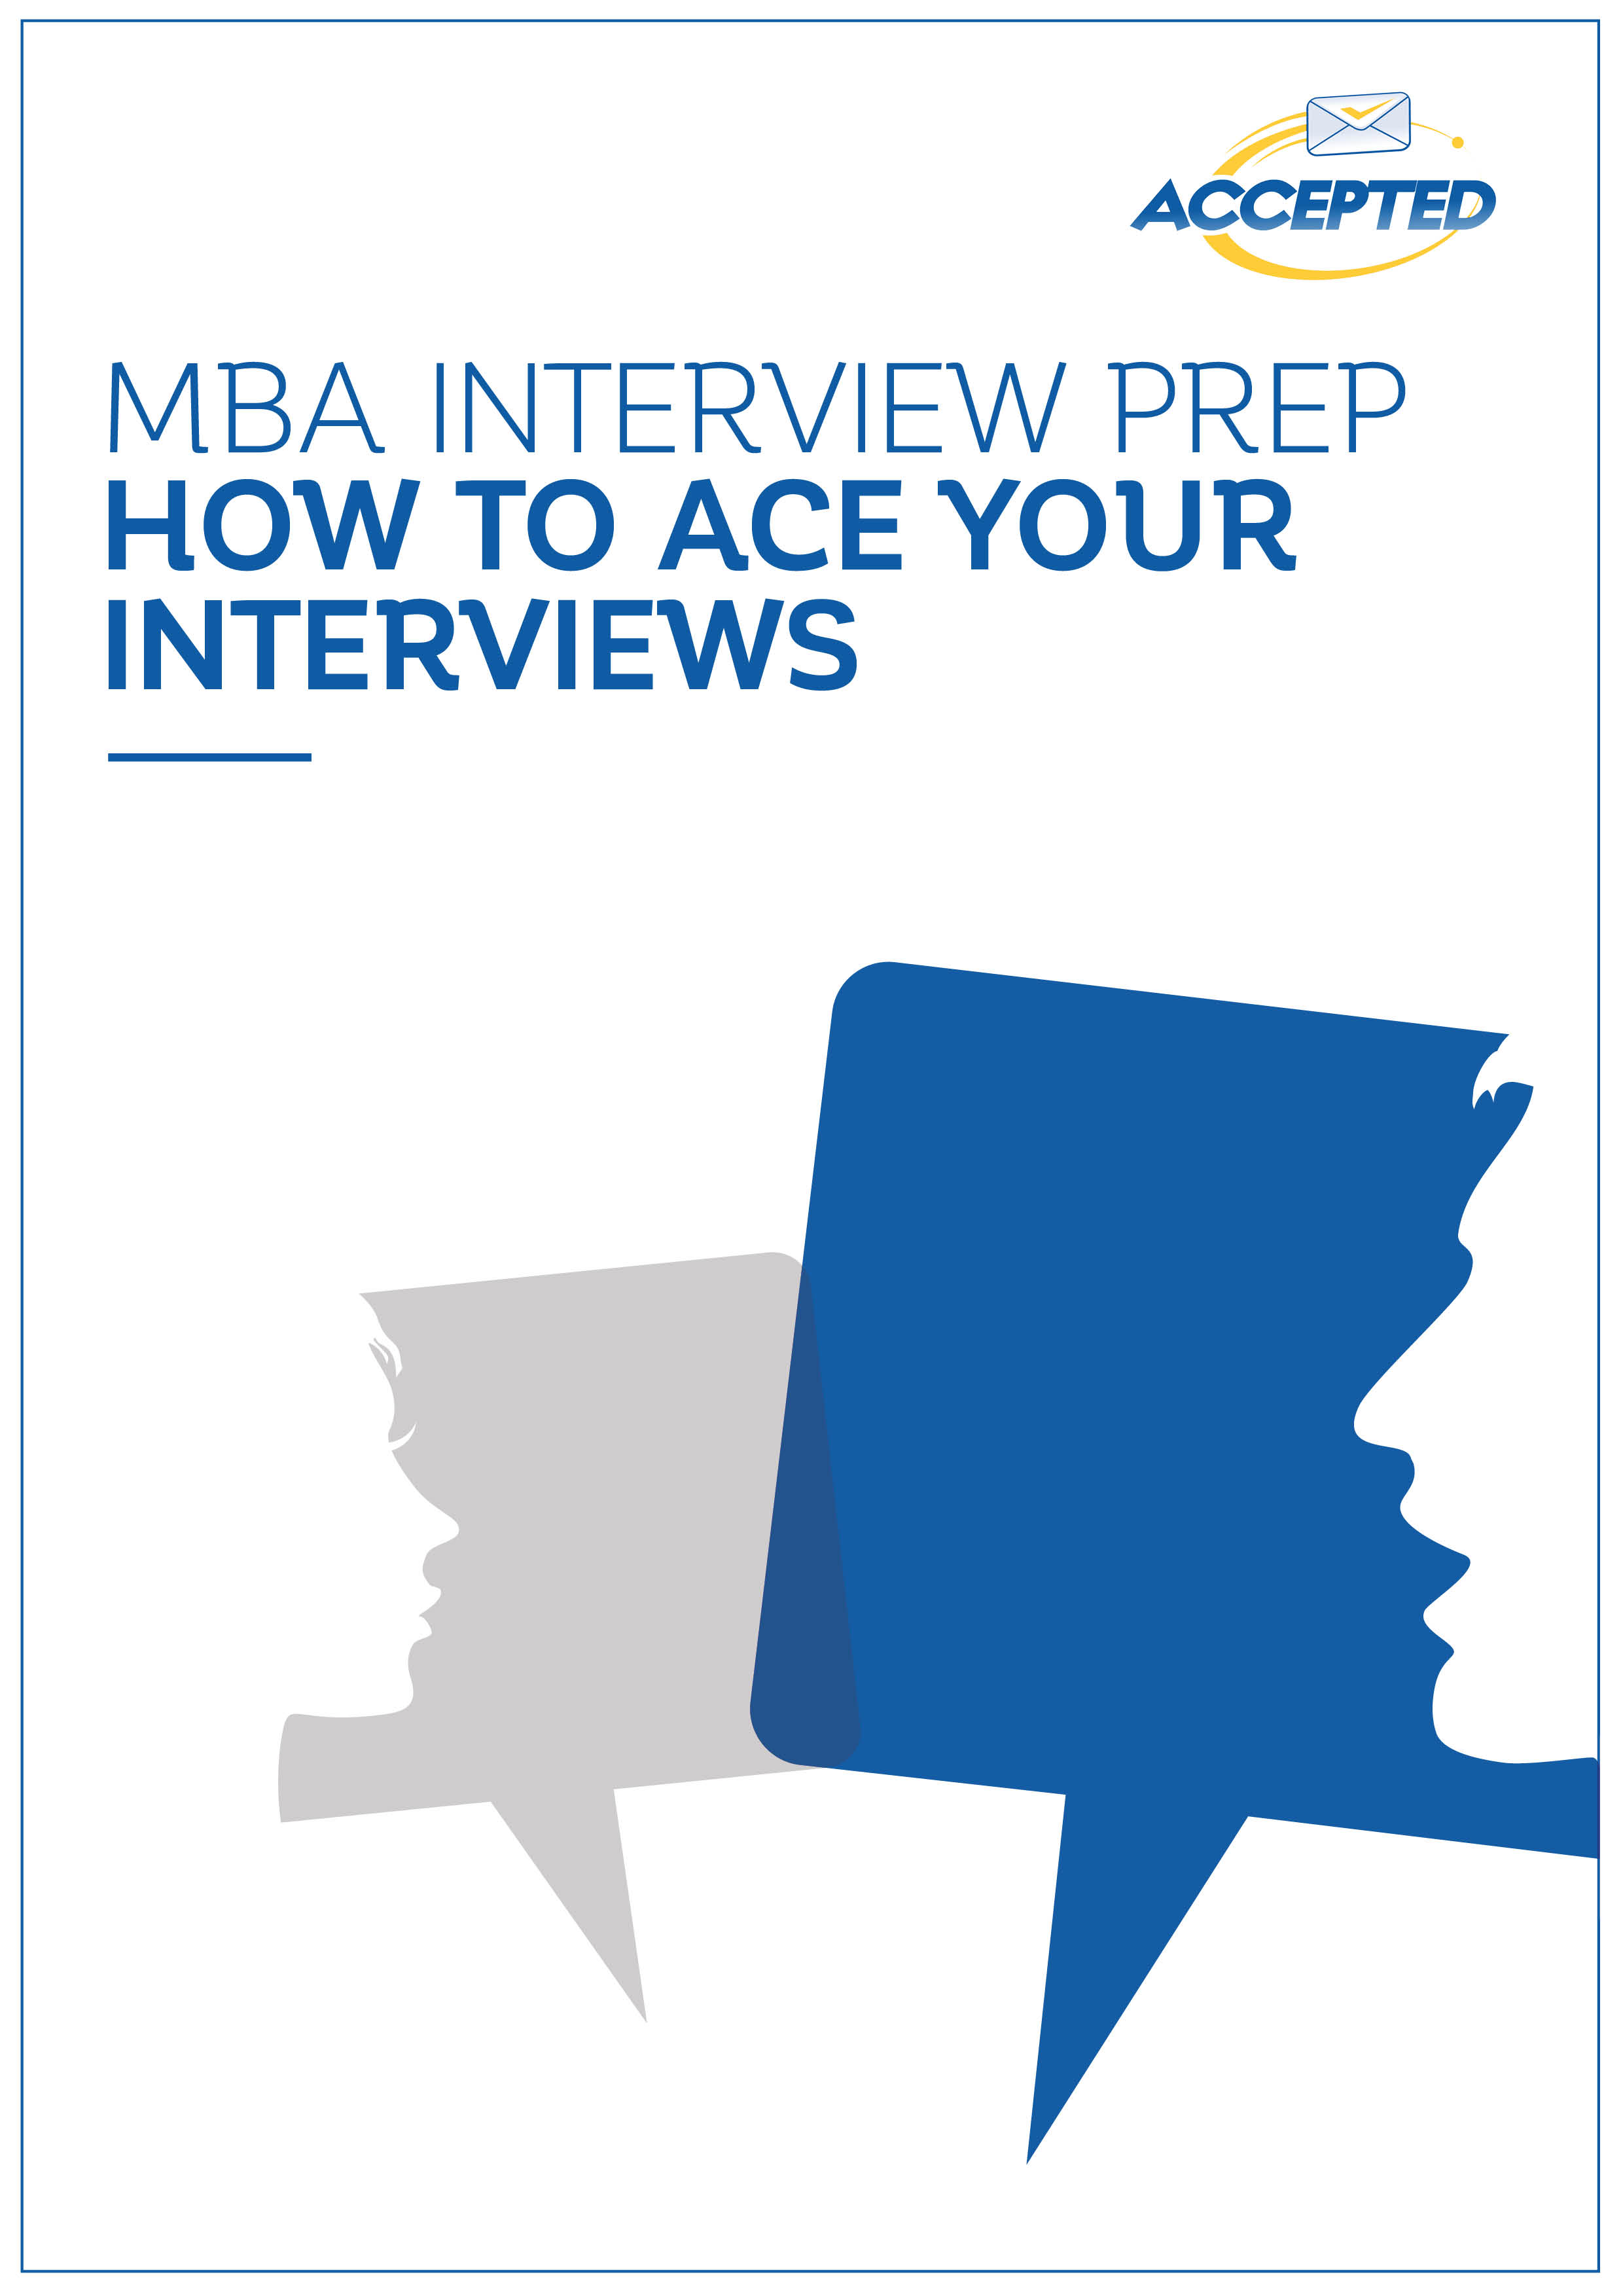 MBA_Interview_Prep_LP.jpg